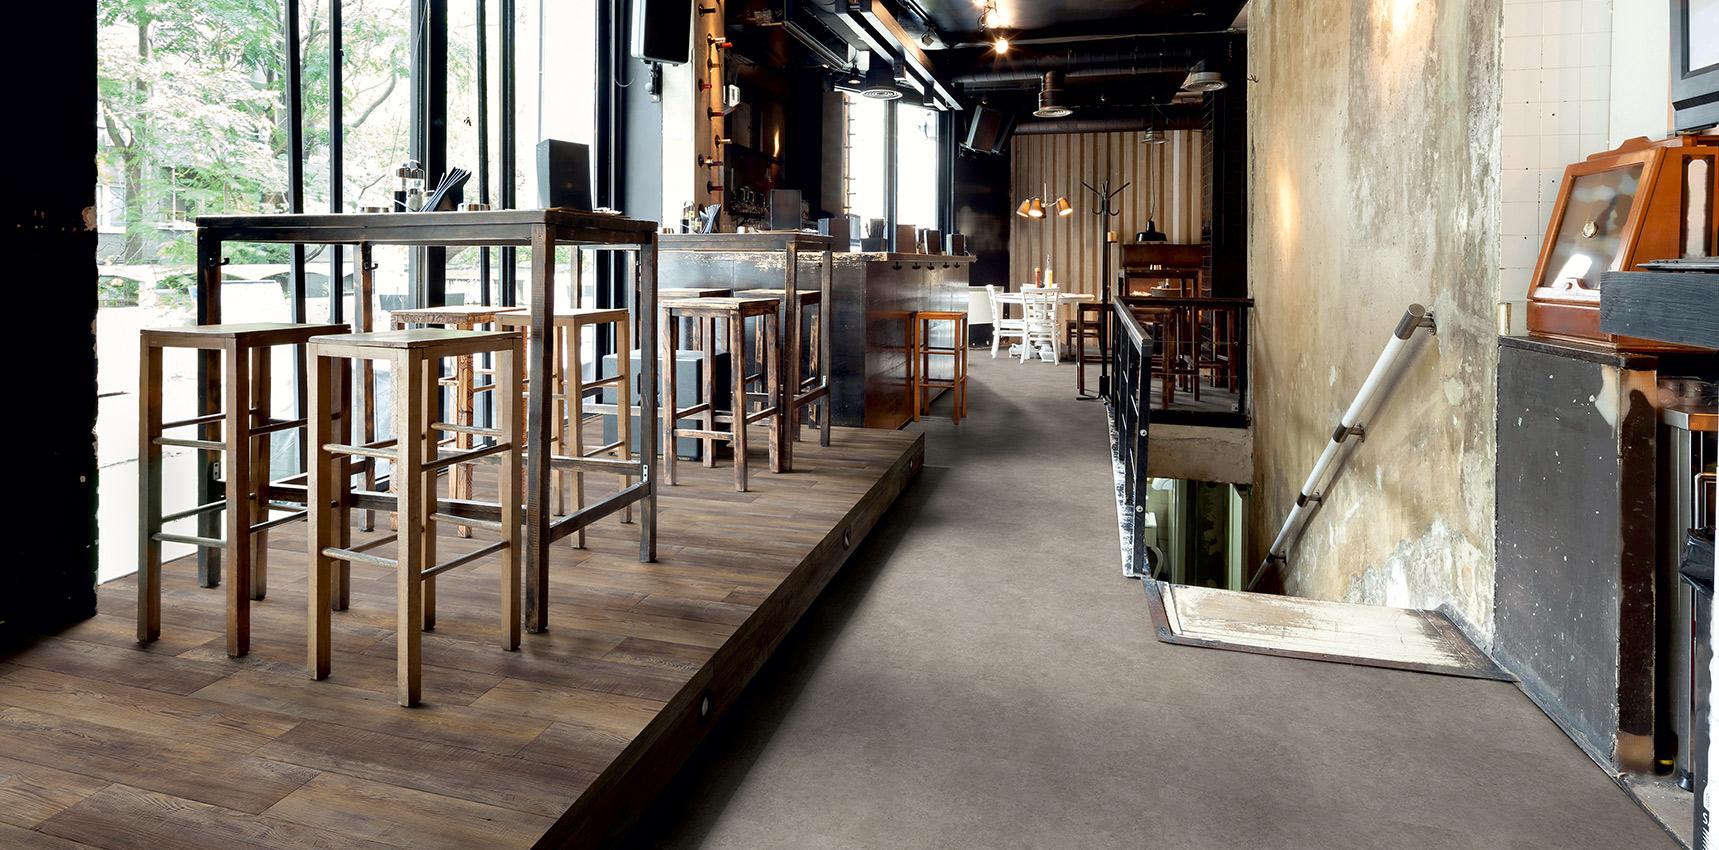 Bodenbelag Cafe Bar Fussboden Betonoptik EIche Rustikal Vinylboden Designboden